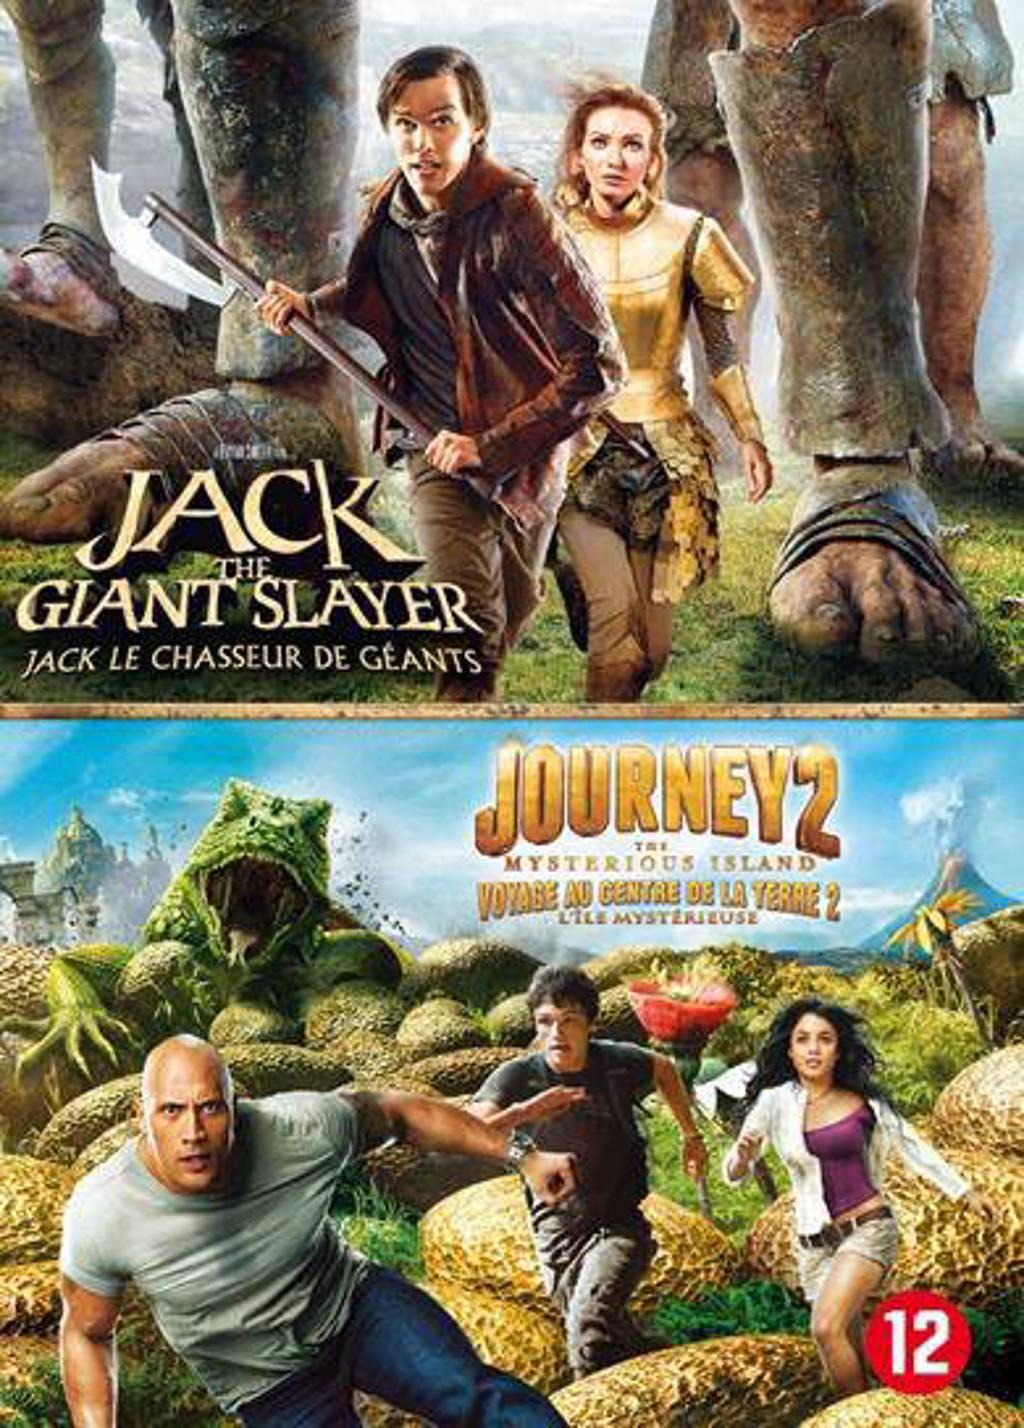 Jack the giant slayer/Journey 2 (DVD)